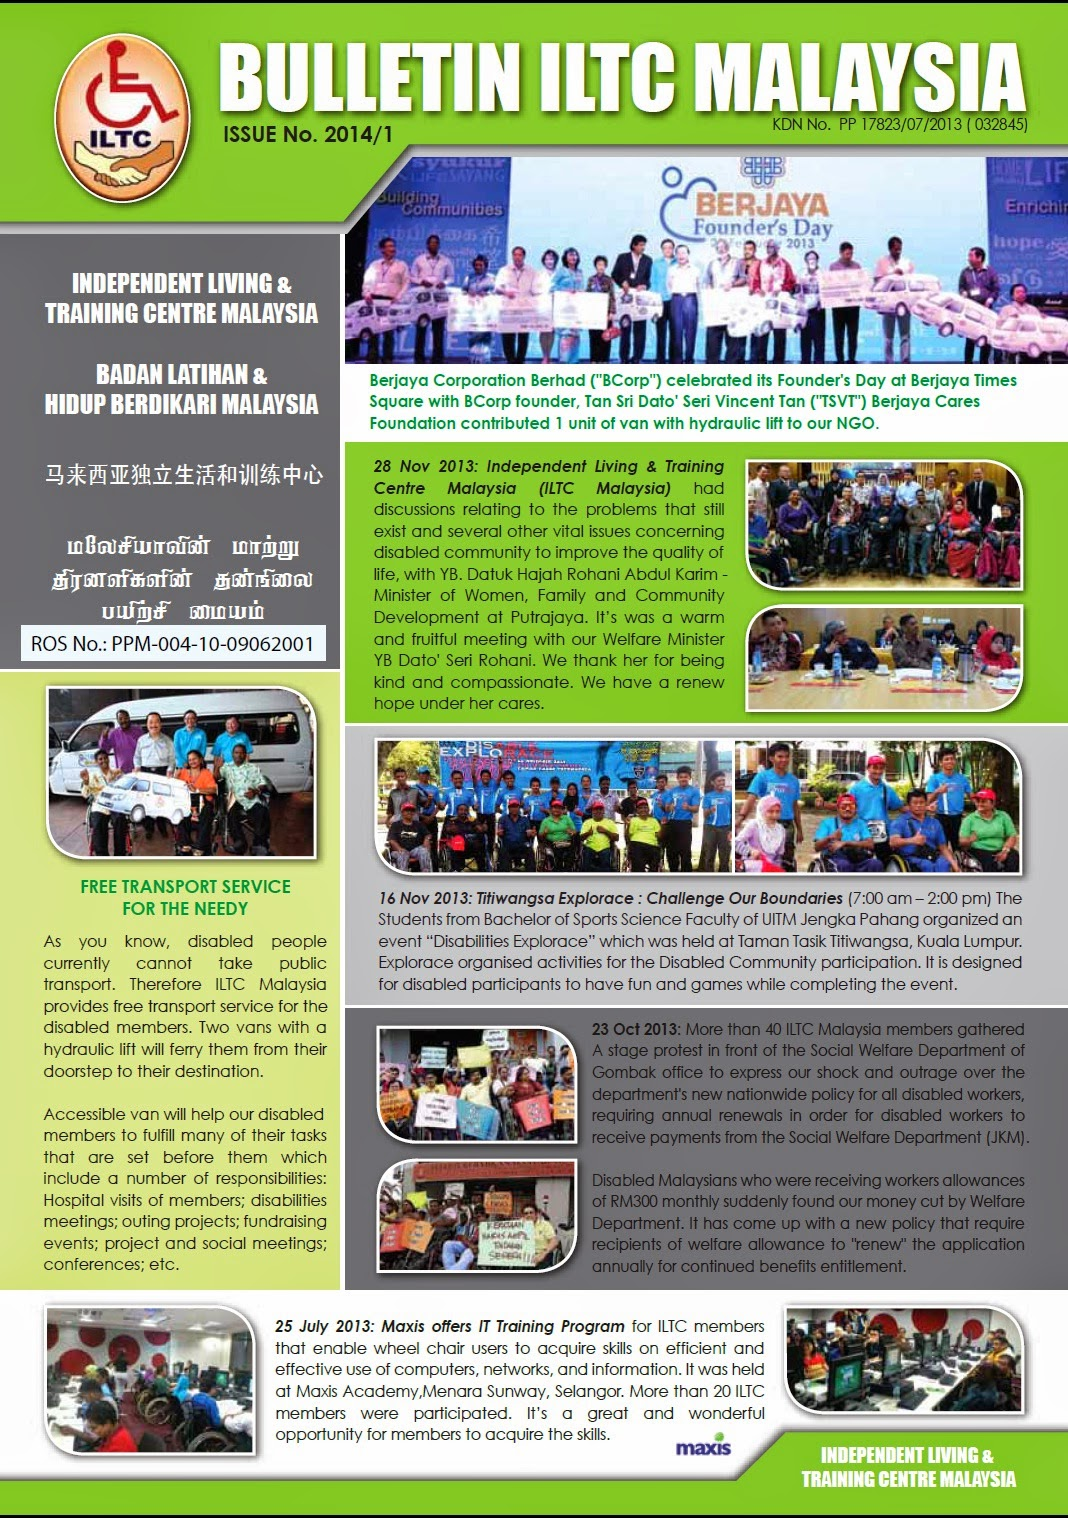 ILTC Malaysia Bulletin 2014 - Page 1